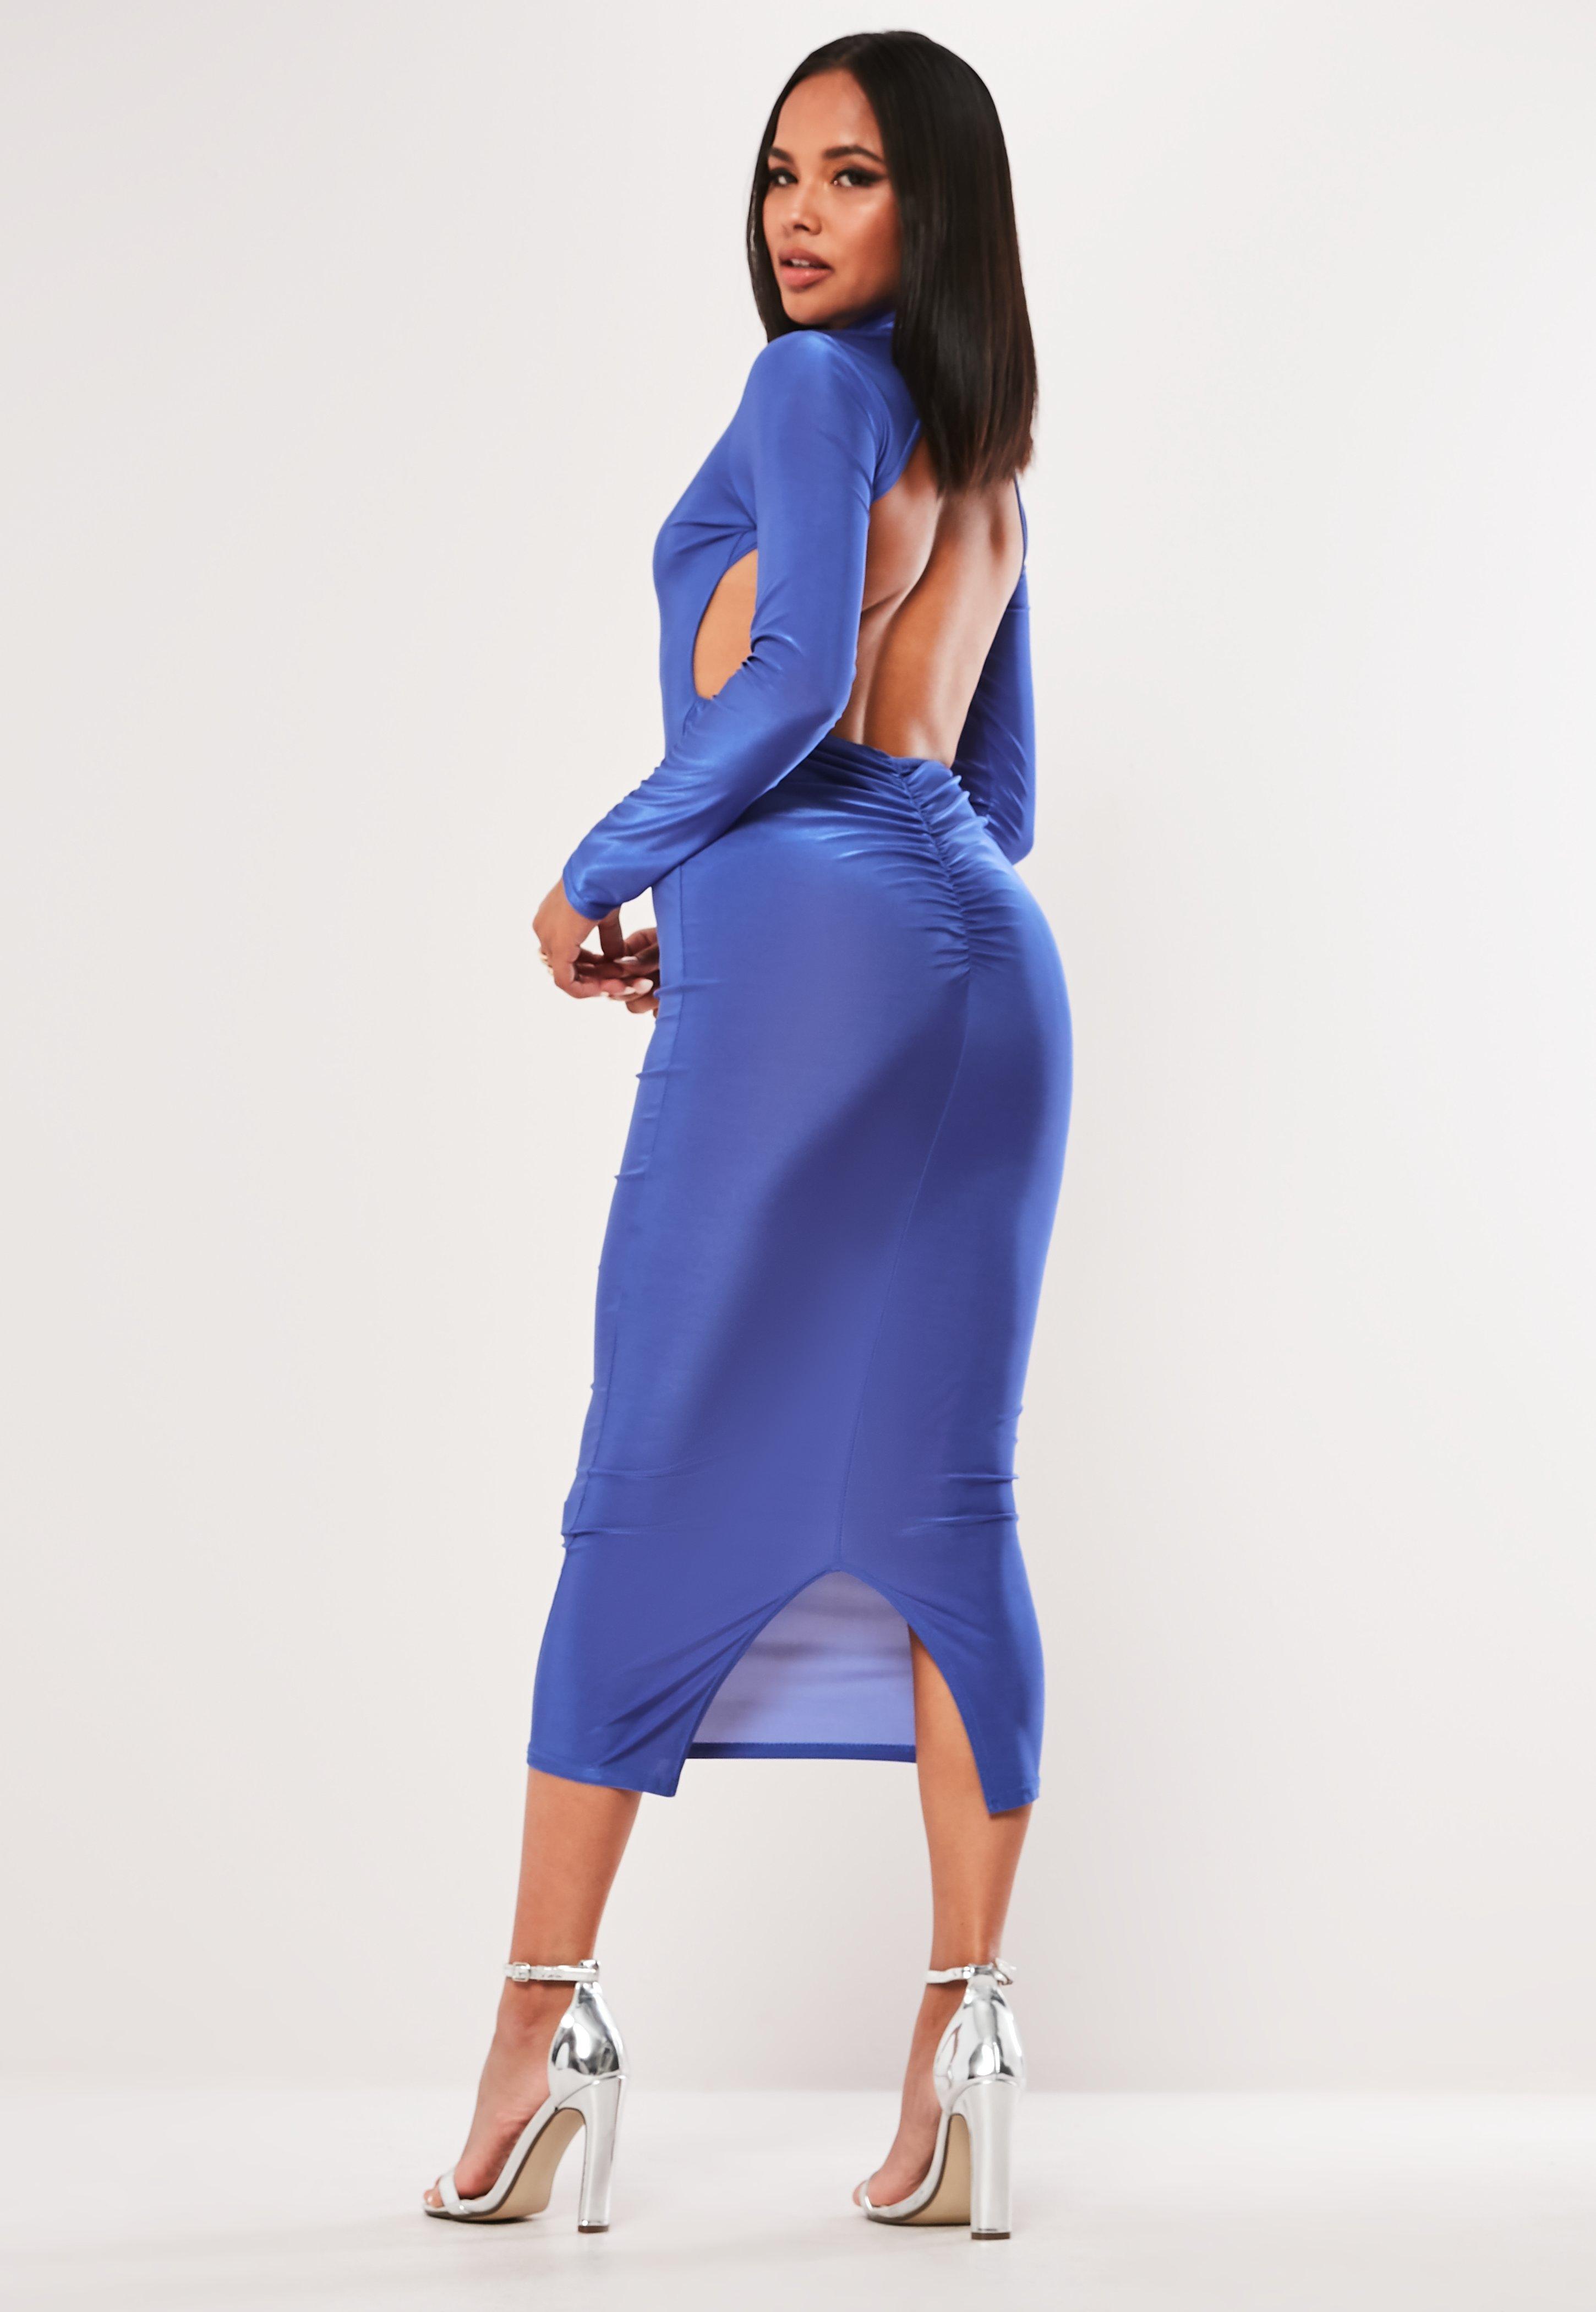 47db9f18d0 Niebieska sukienka midaxi z wycięciem na plecach